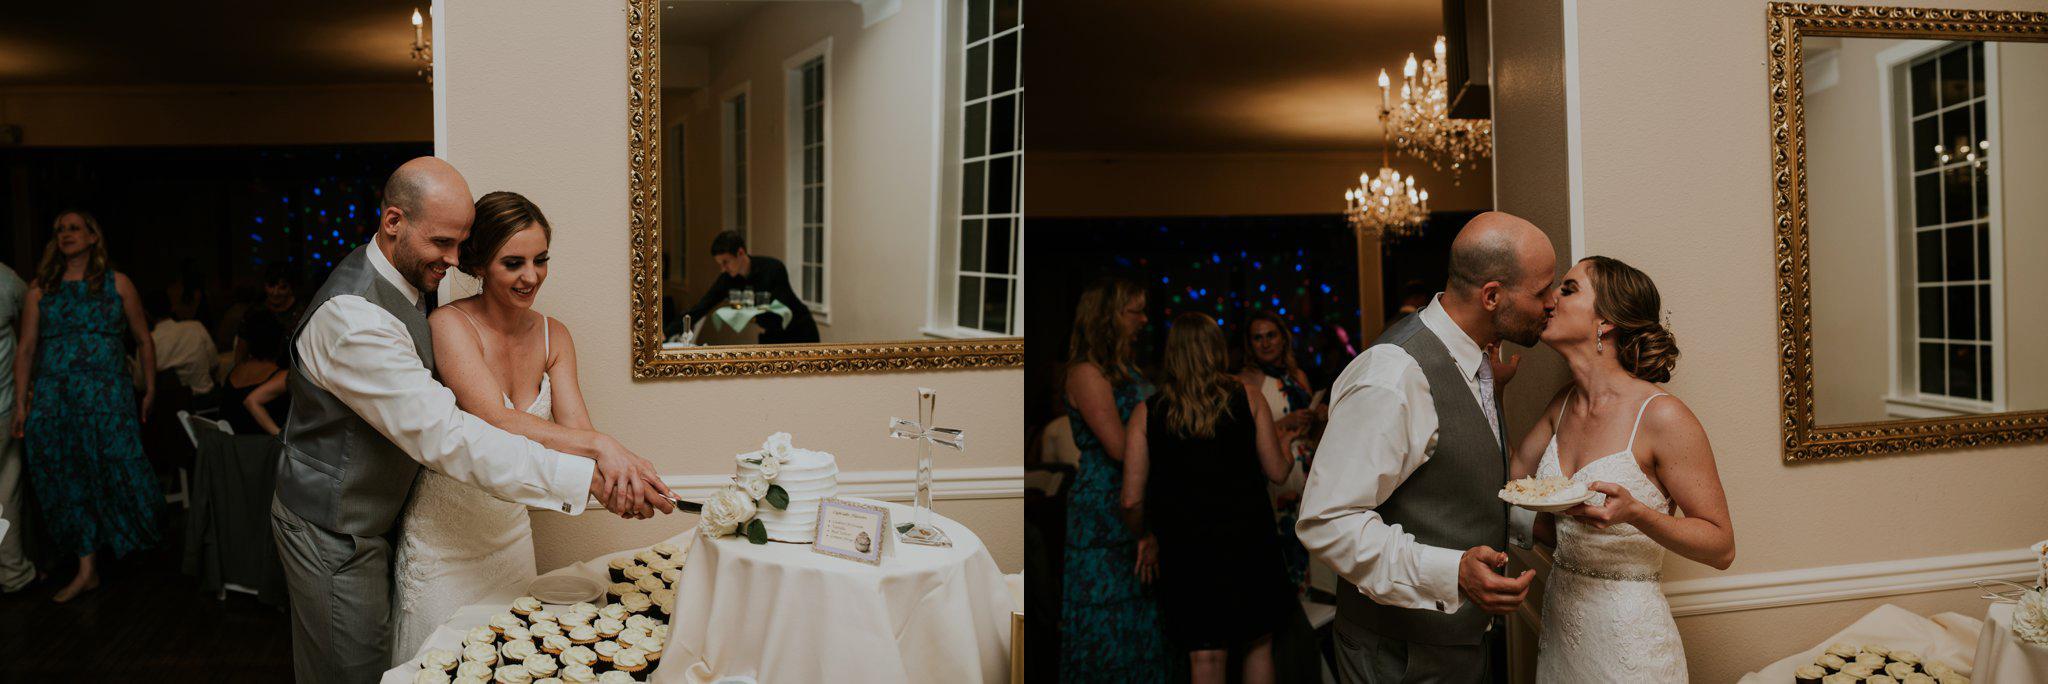 hollywood-school-house-wedding-seattle-photographer-caitlyn-nikula-118.jpg